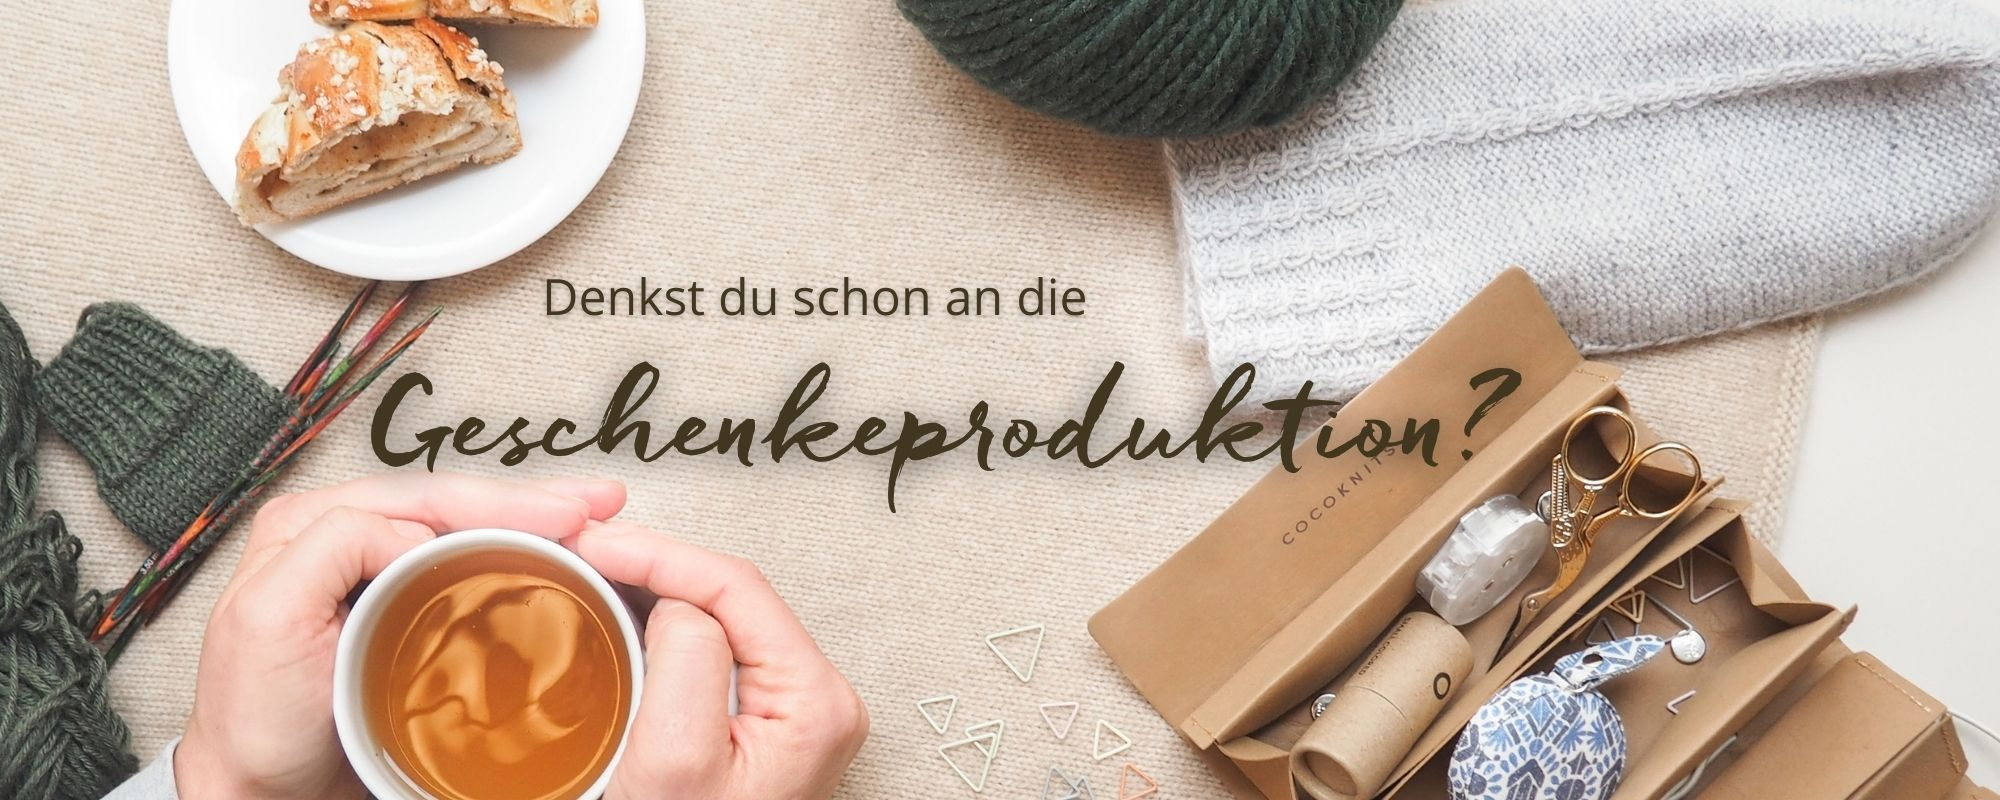 Geschenkeproduktion Header NL 2000x700